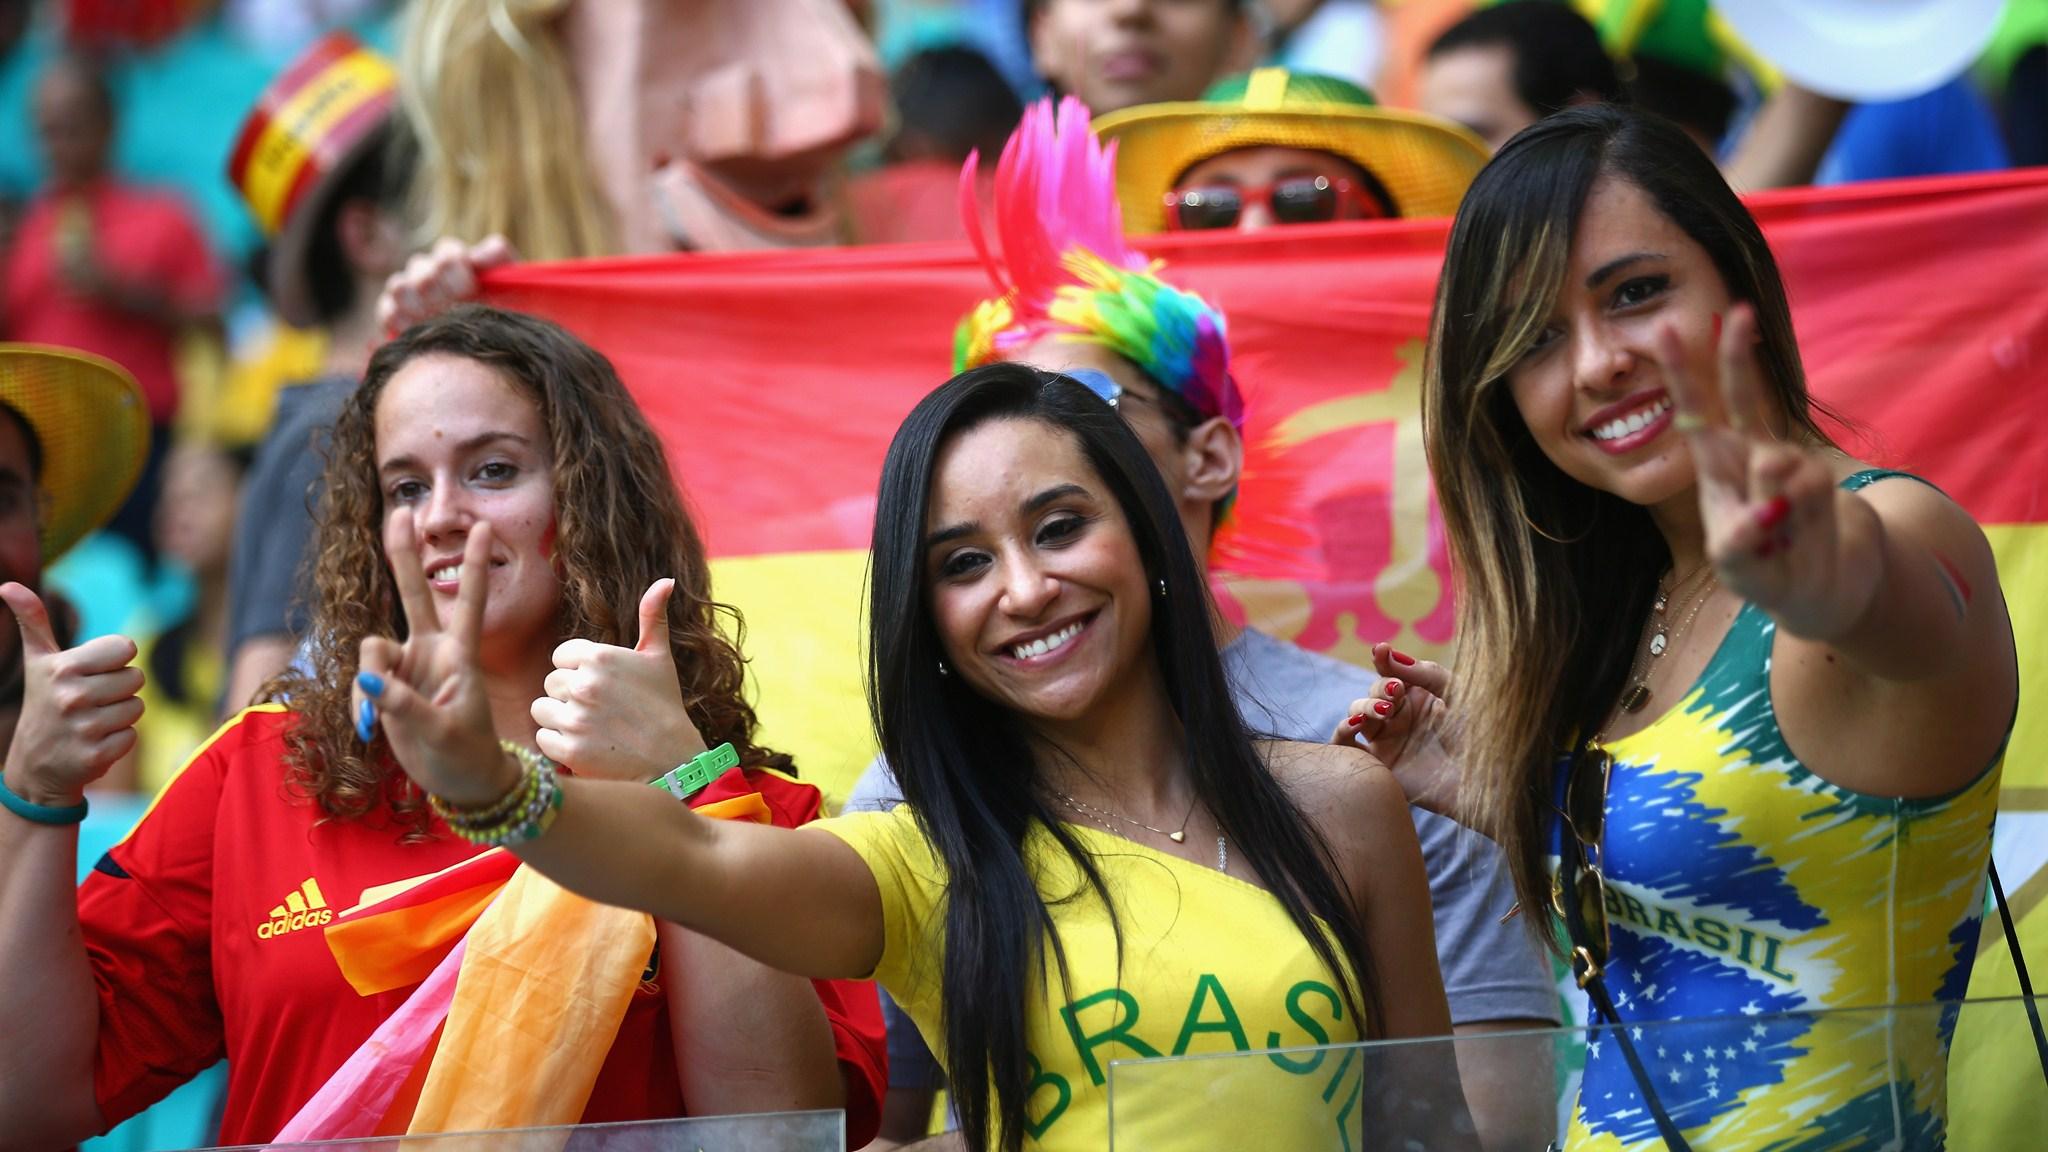 147 - Spain-Netherlands [1-5] -- 13 Jun 2014 - 16-00 -- Salvador - Arena Fonte Nova - kuaza